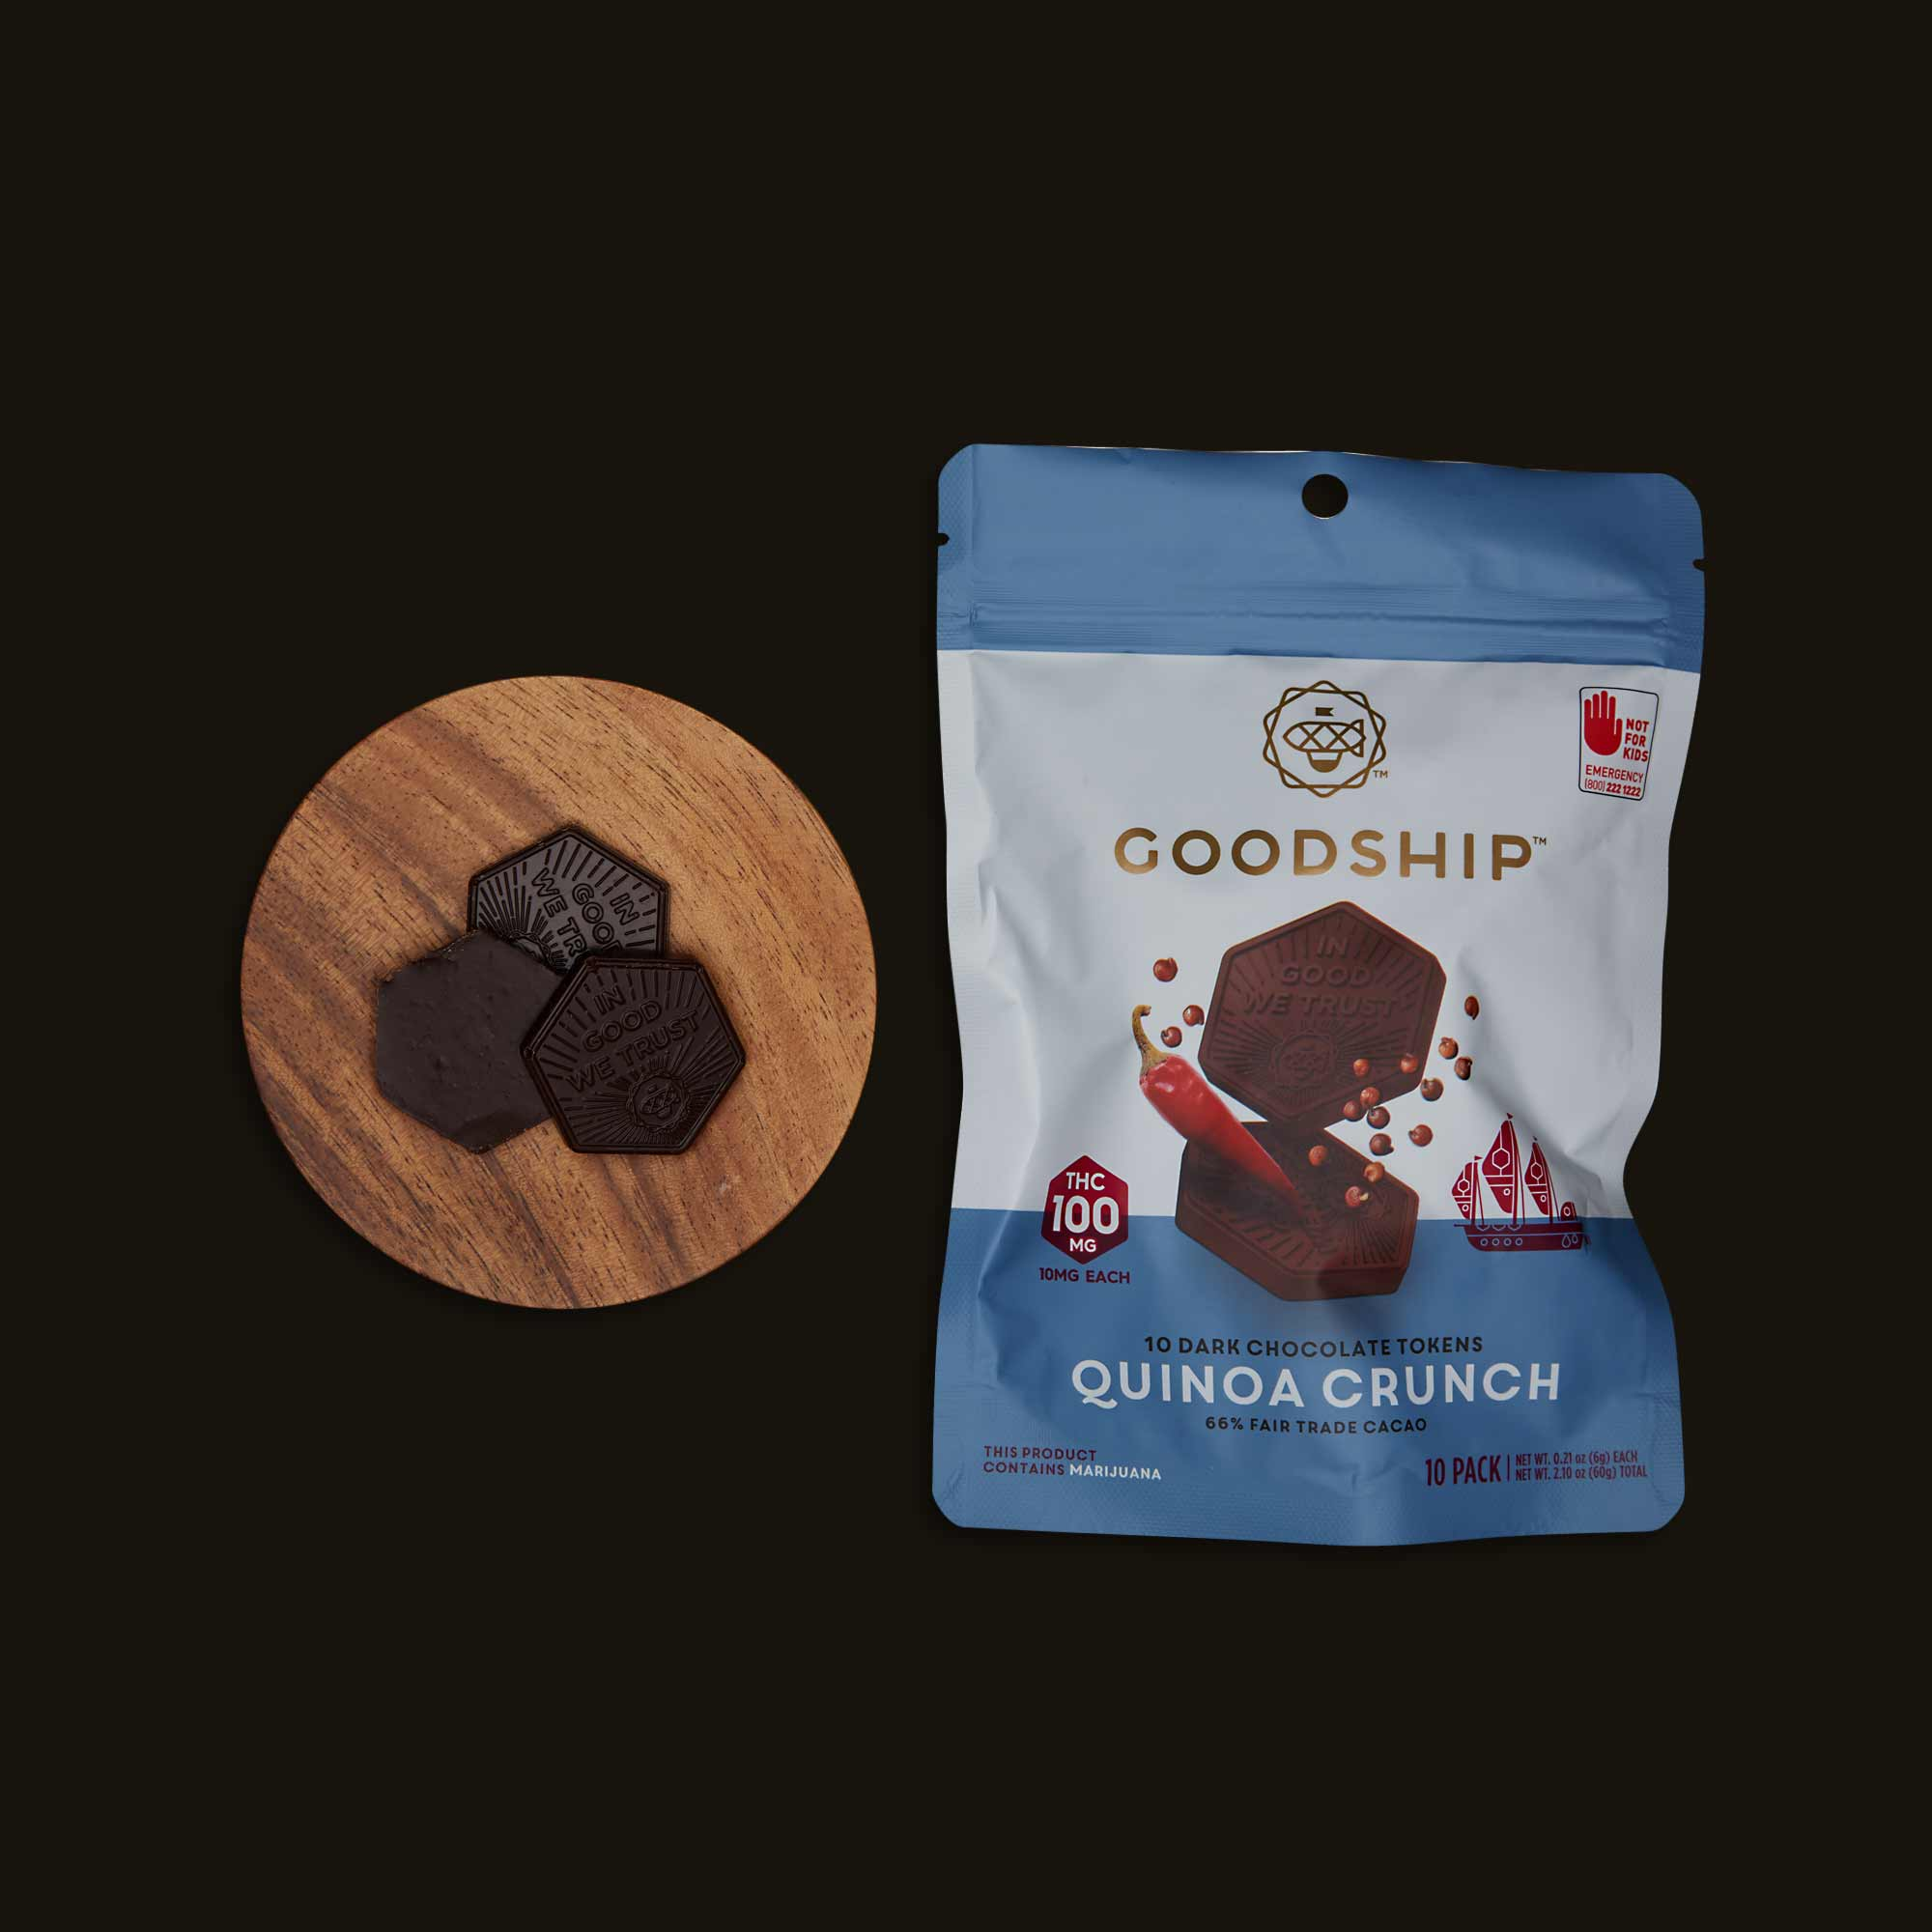 Goodship Quinoa Crunch Chocolate Tokens